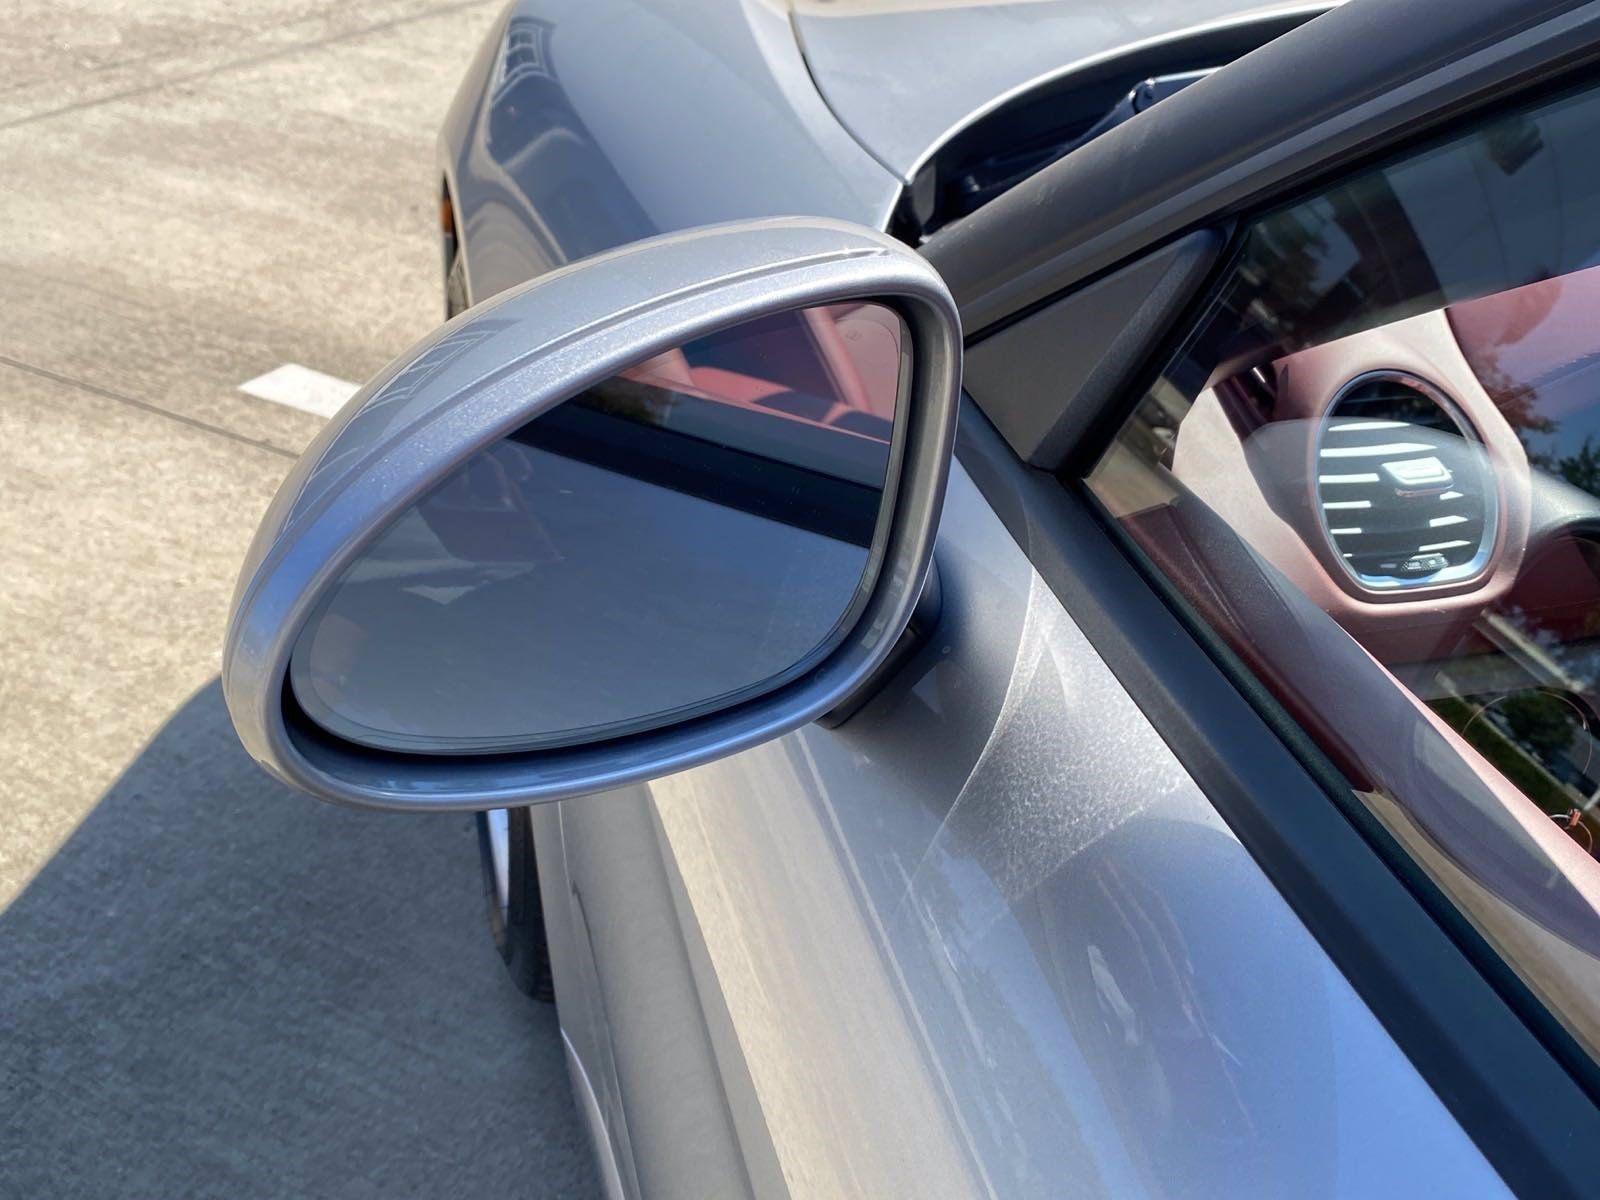 2022 Porsche Boxster 25 Years – 5